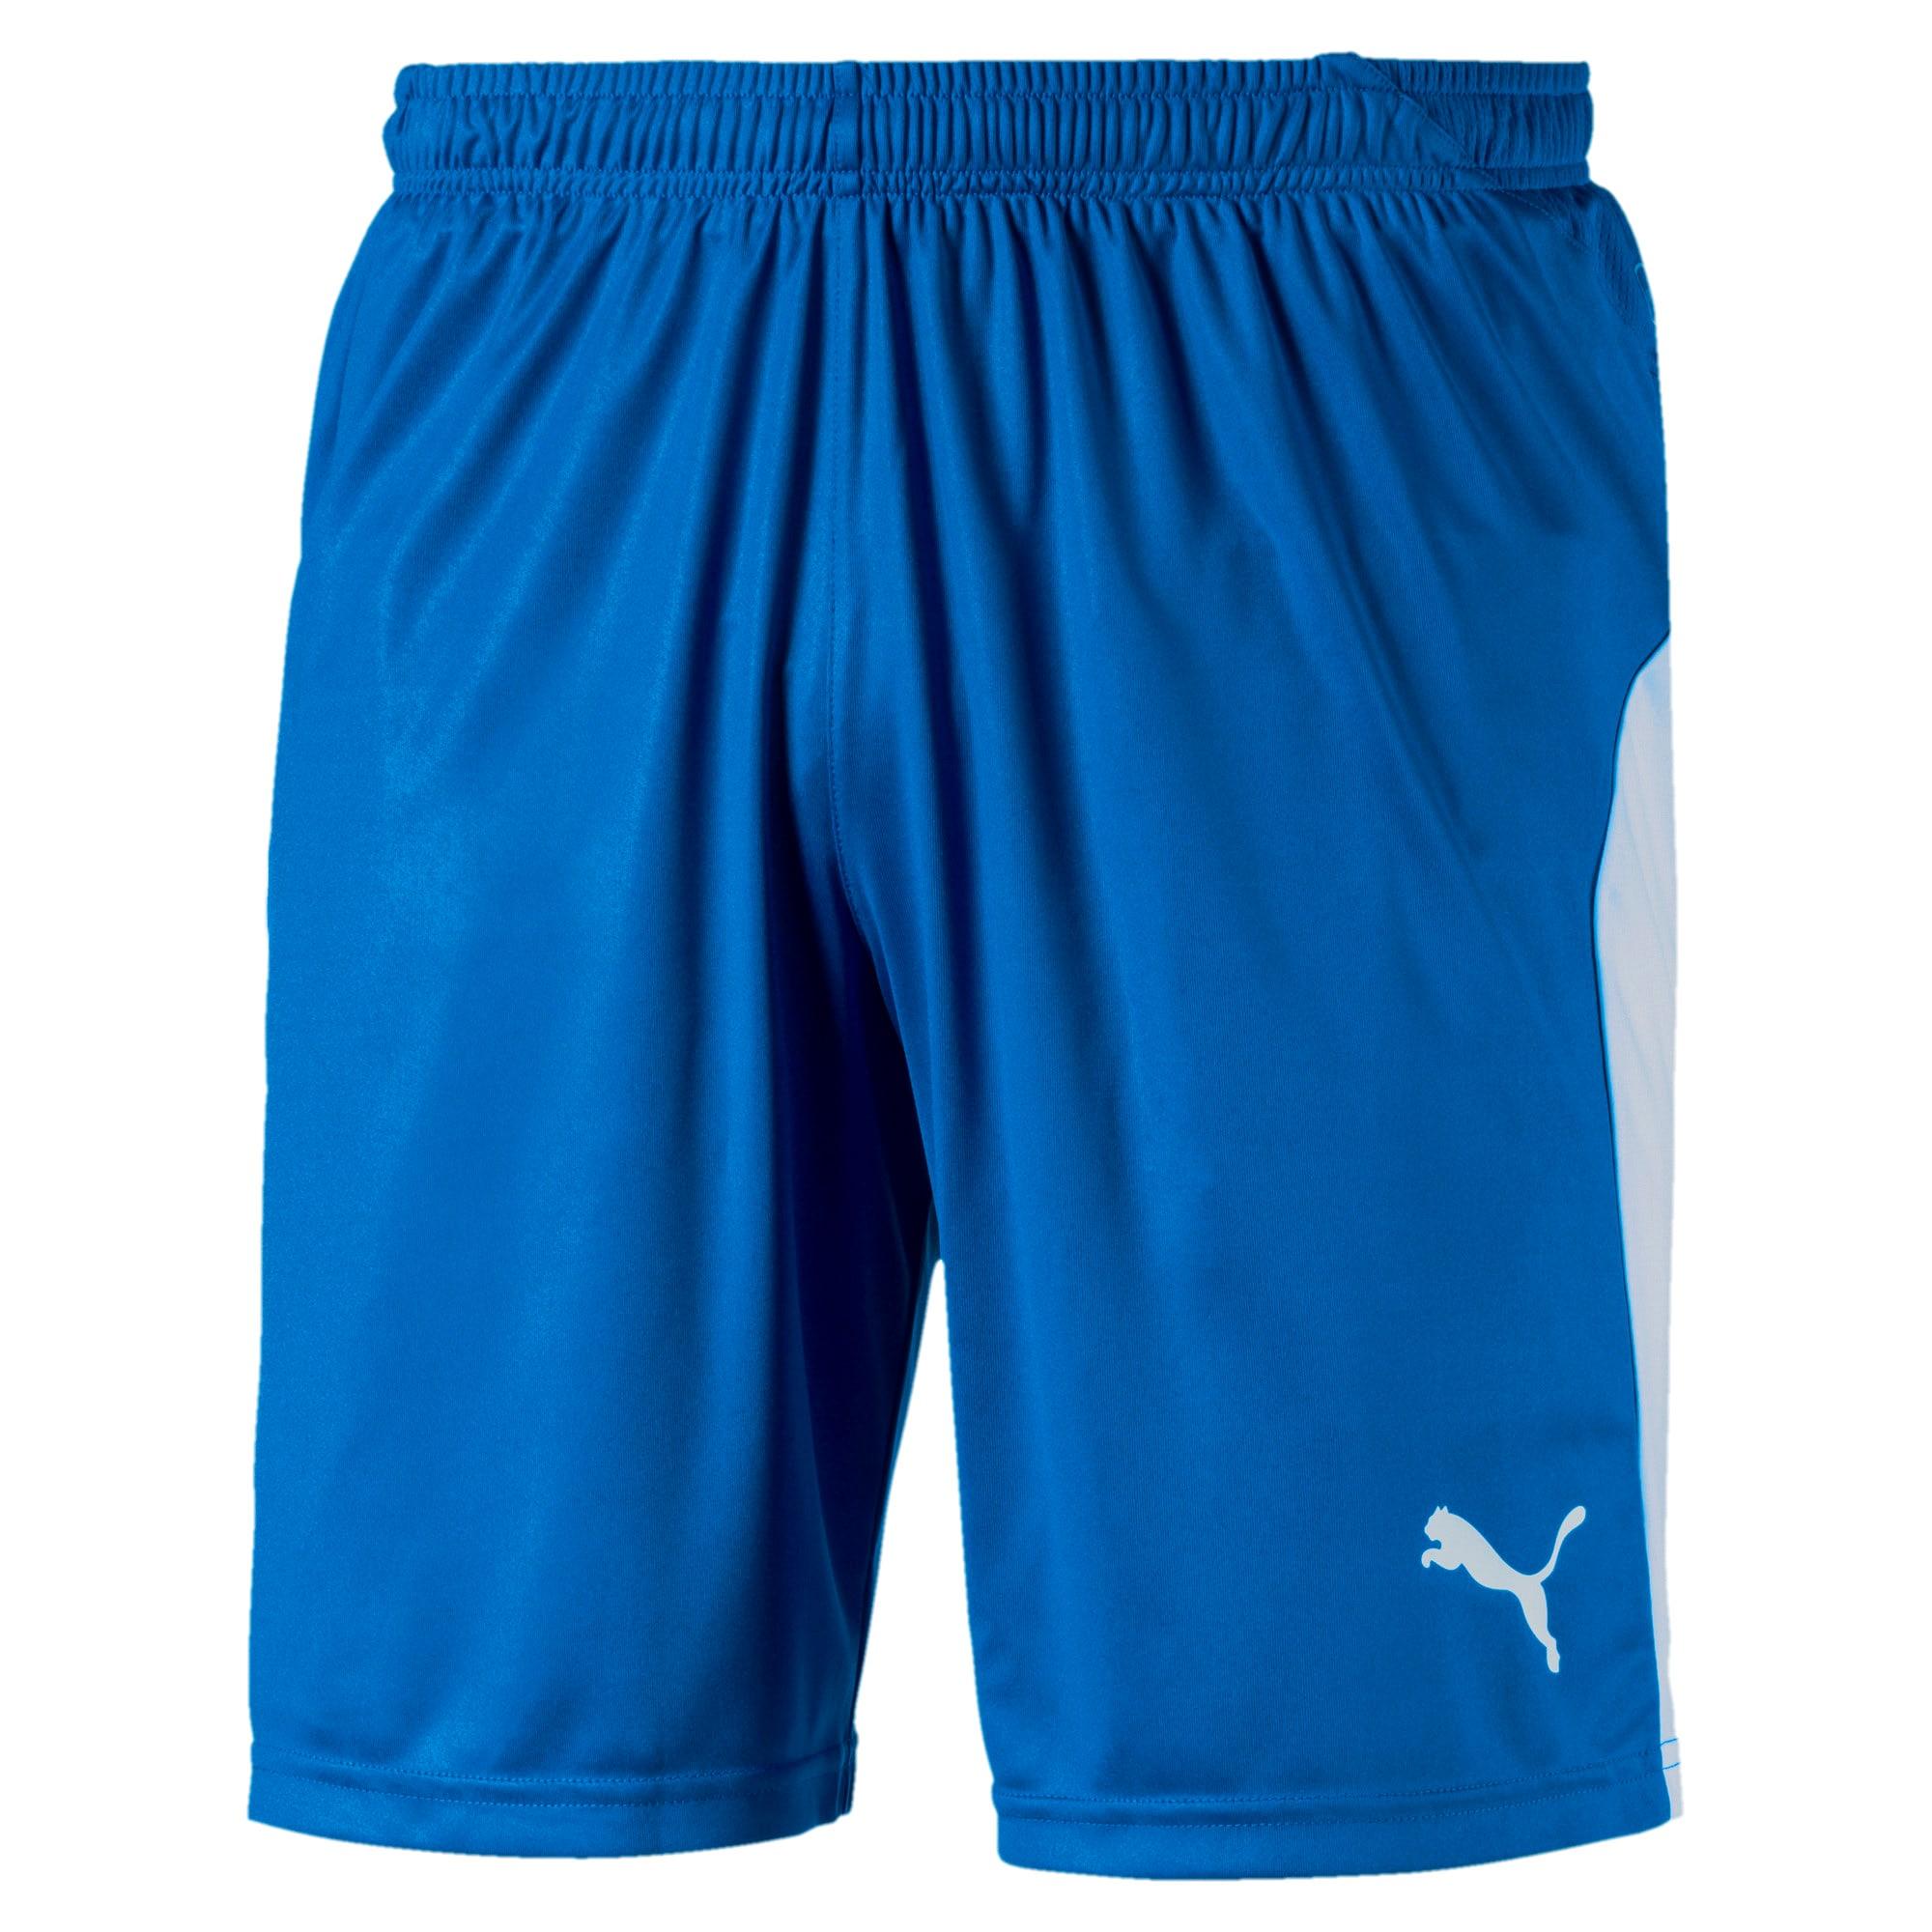 Thumbnail 1 of LIGA Men's Shorts, Electric Blue Lemonade-White, medium